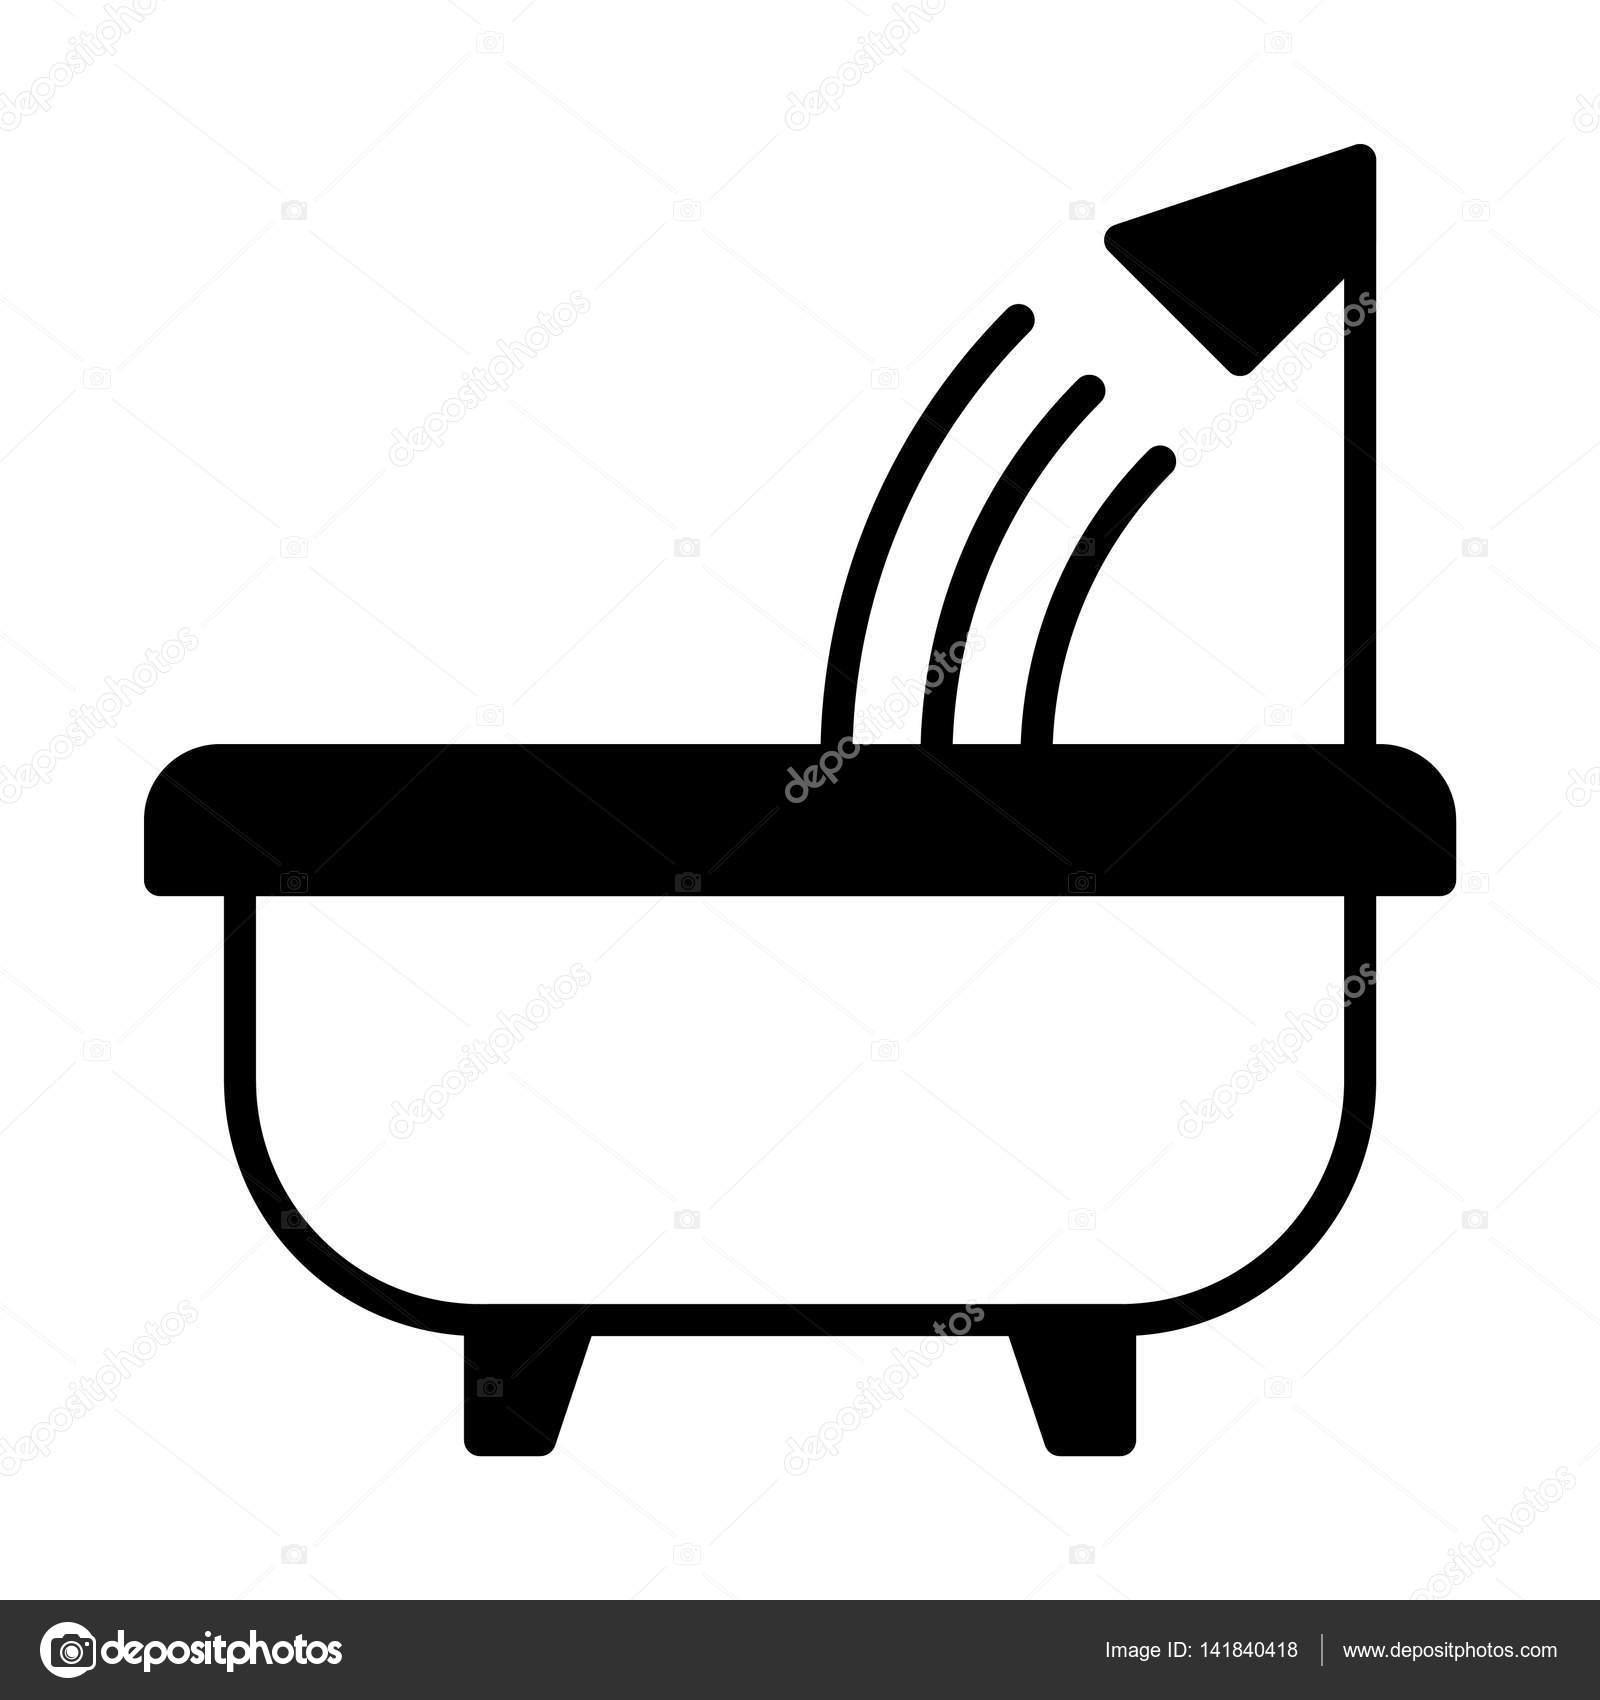 diseño de icono de baño — vector de stock © everydaytemplate